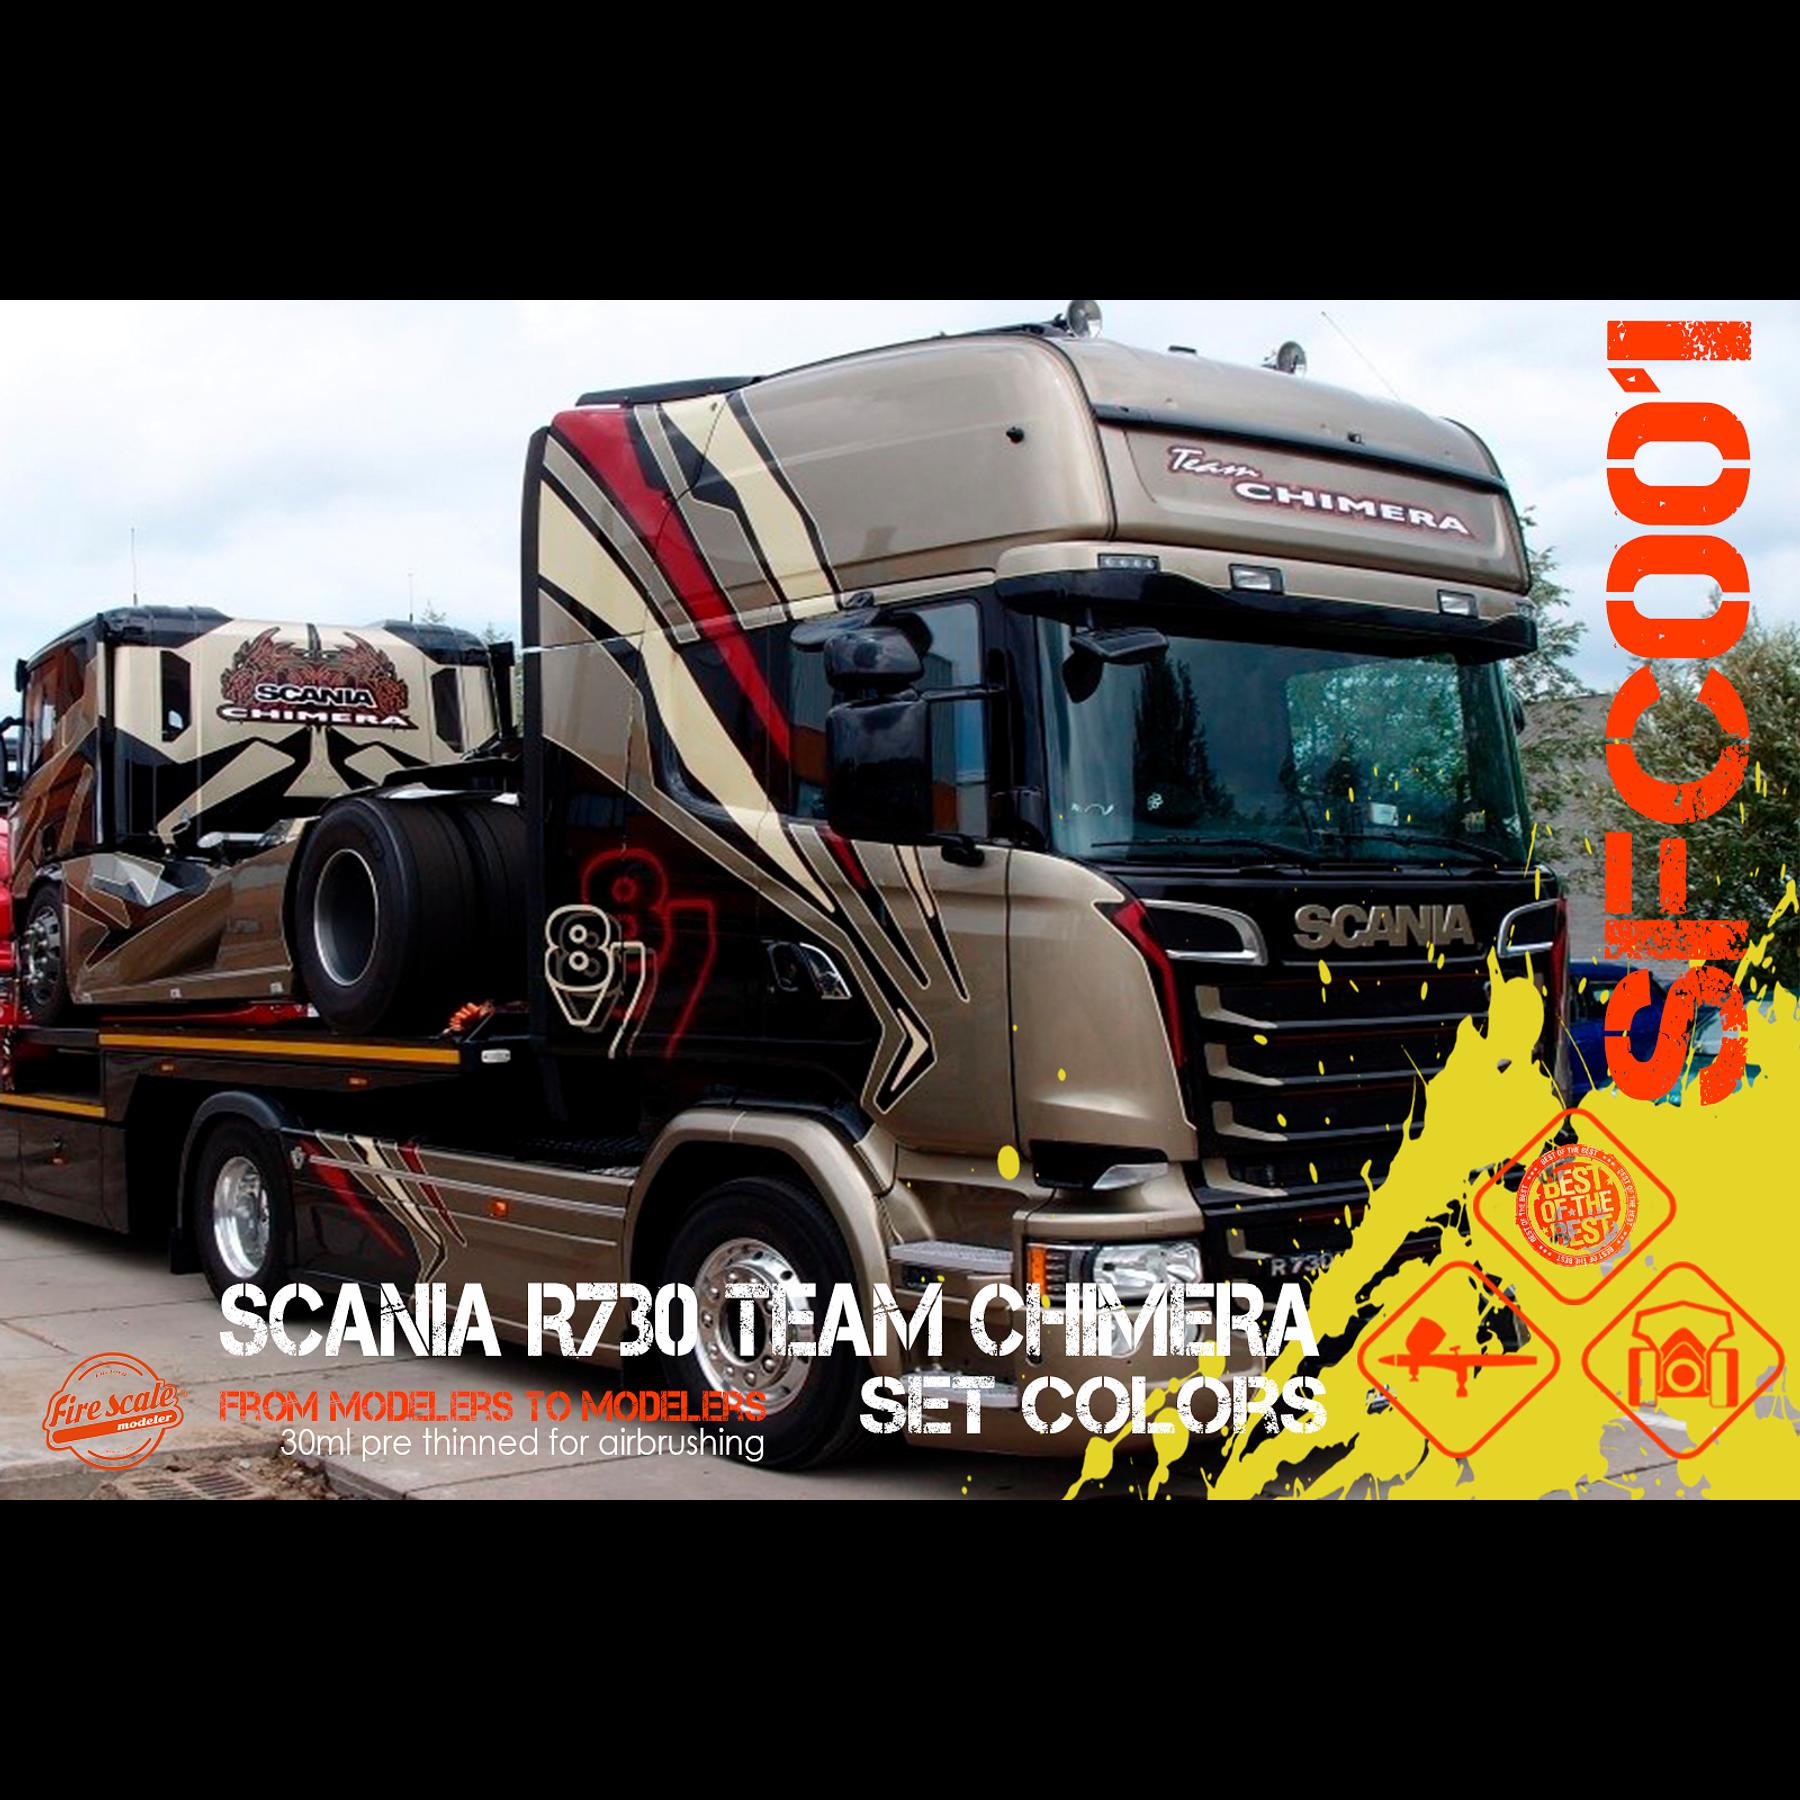 Jeu de couleurs Scania R730